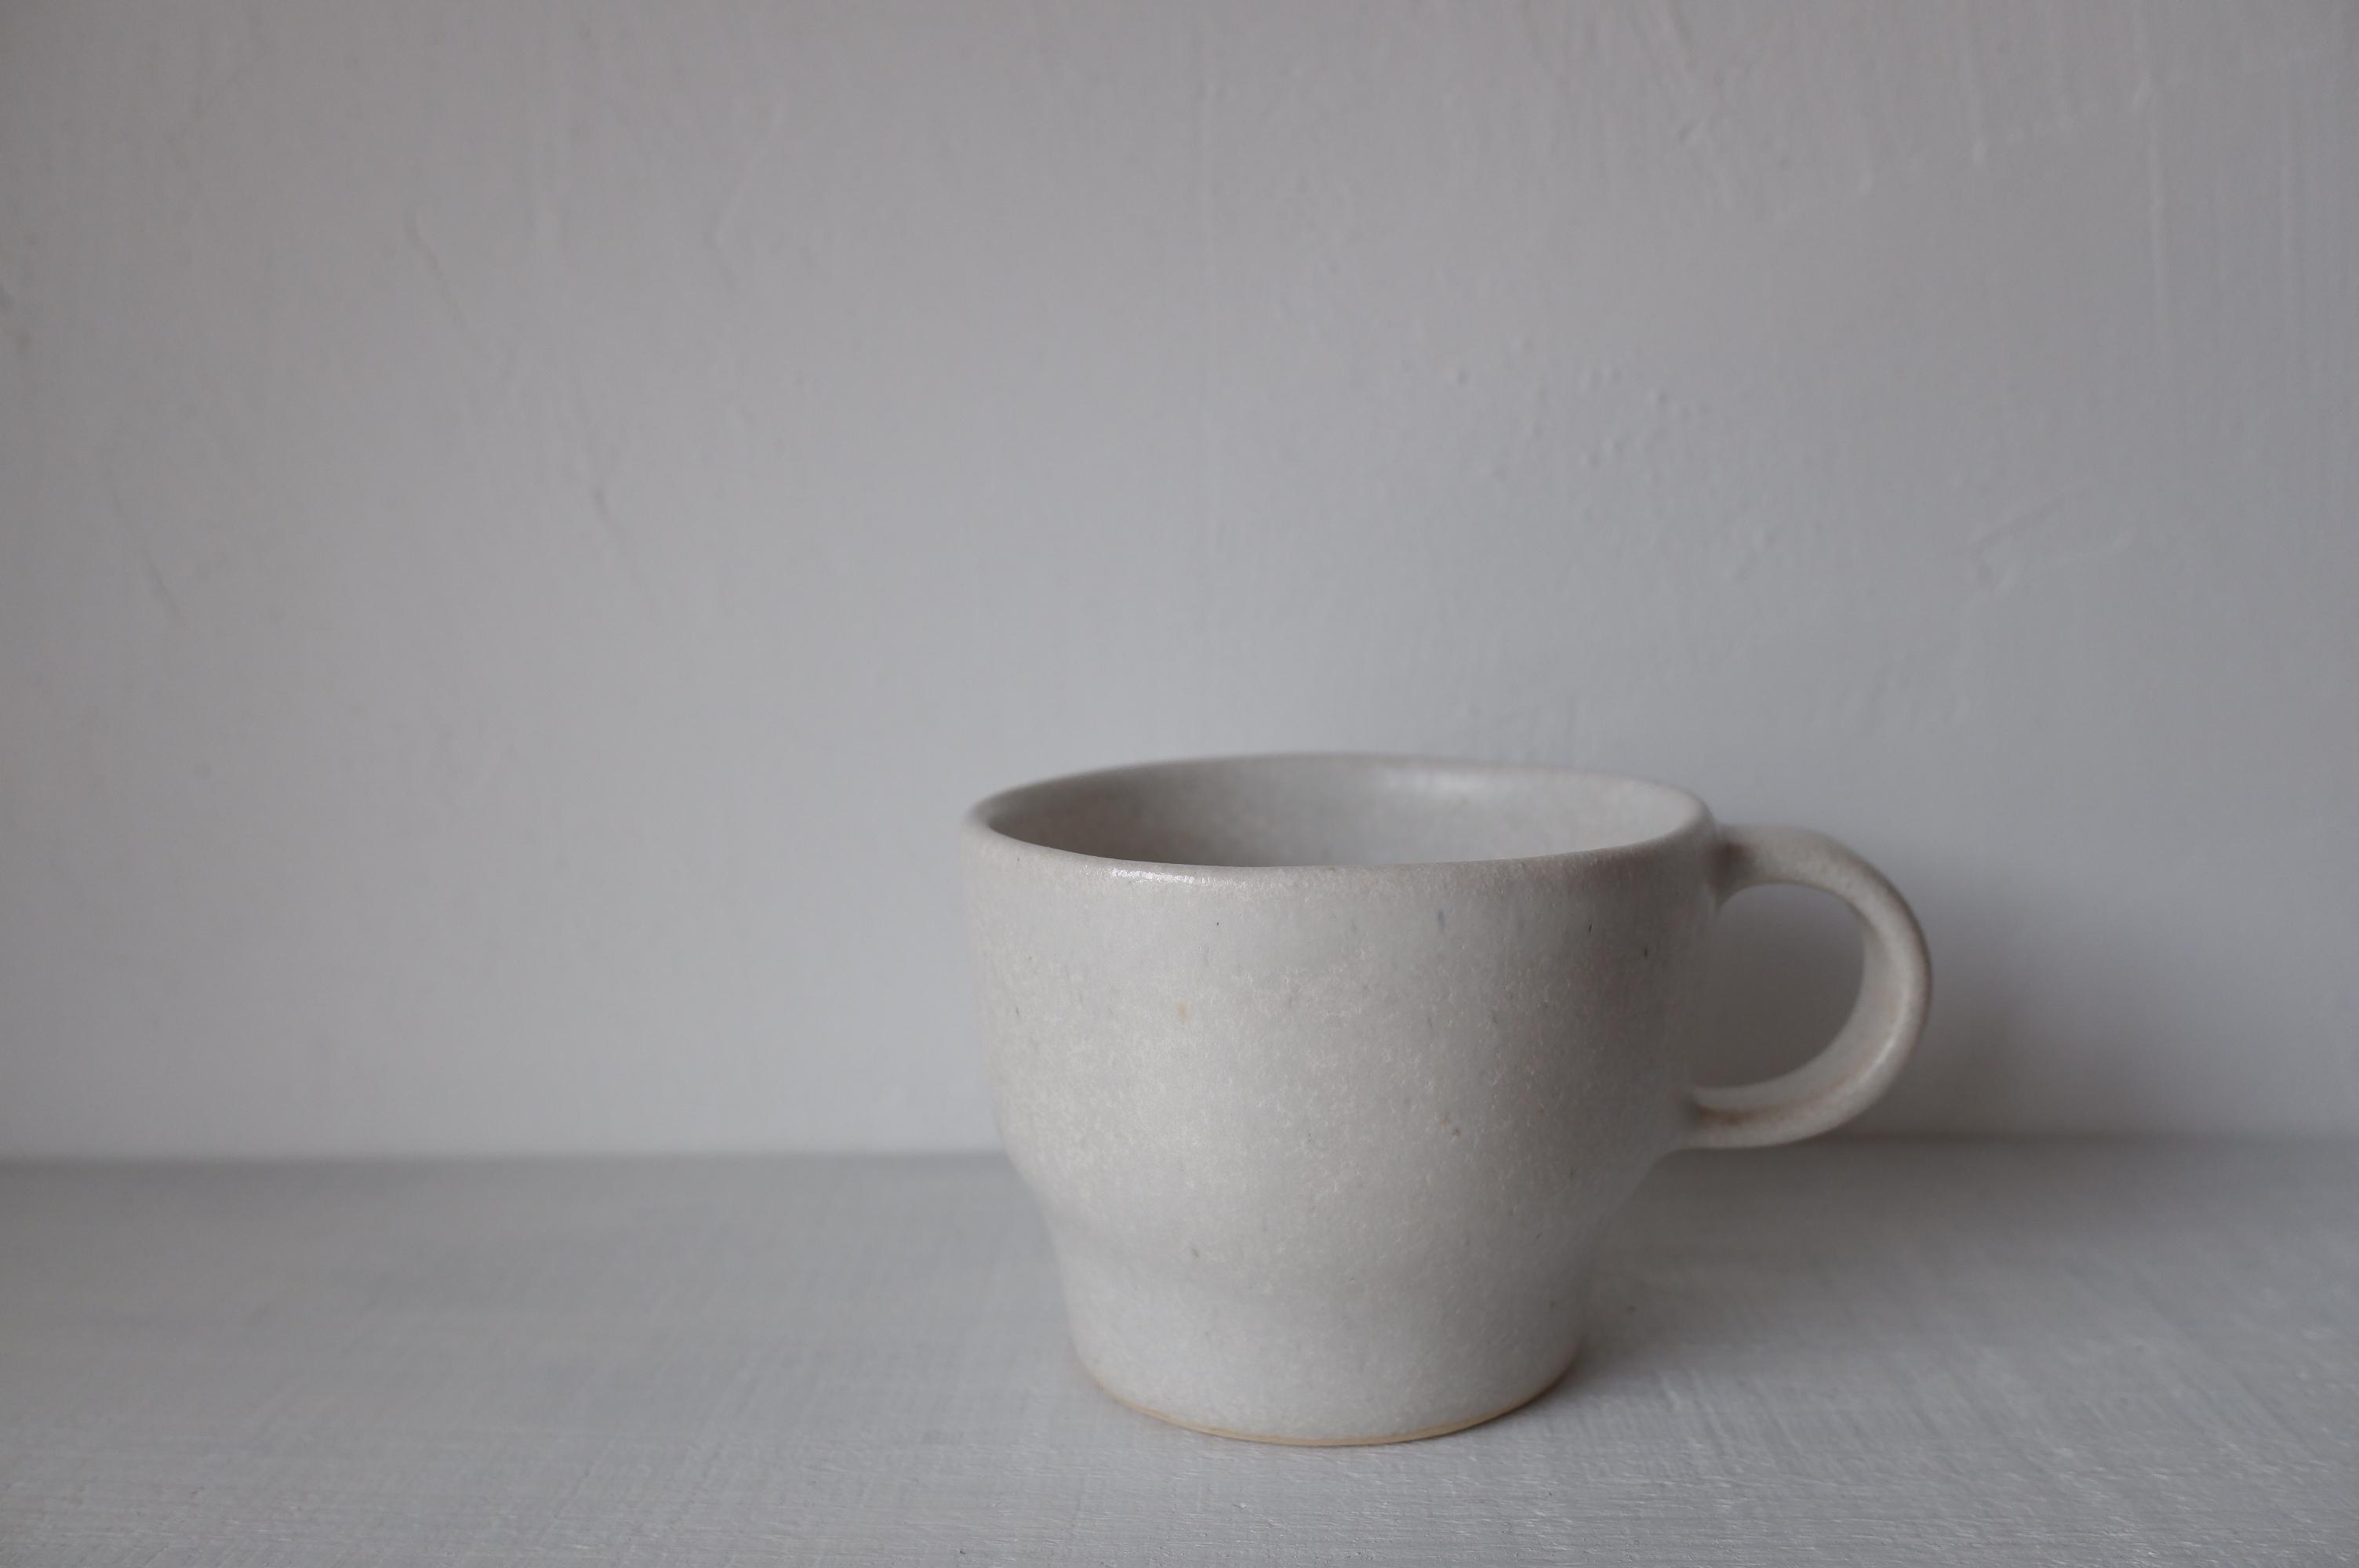 Dona ceramic studio 入江佑子 マグカップ